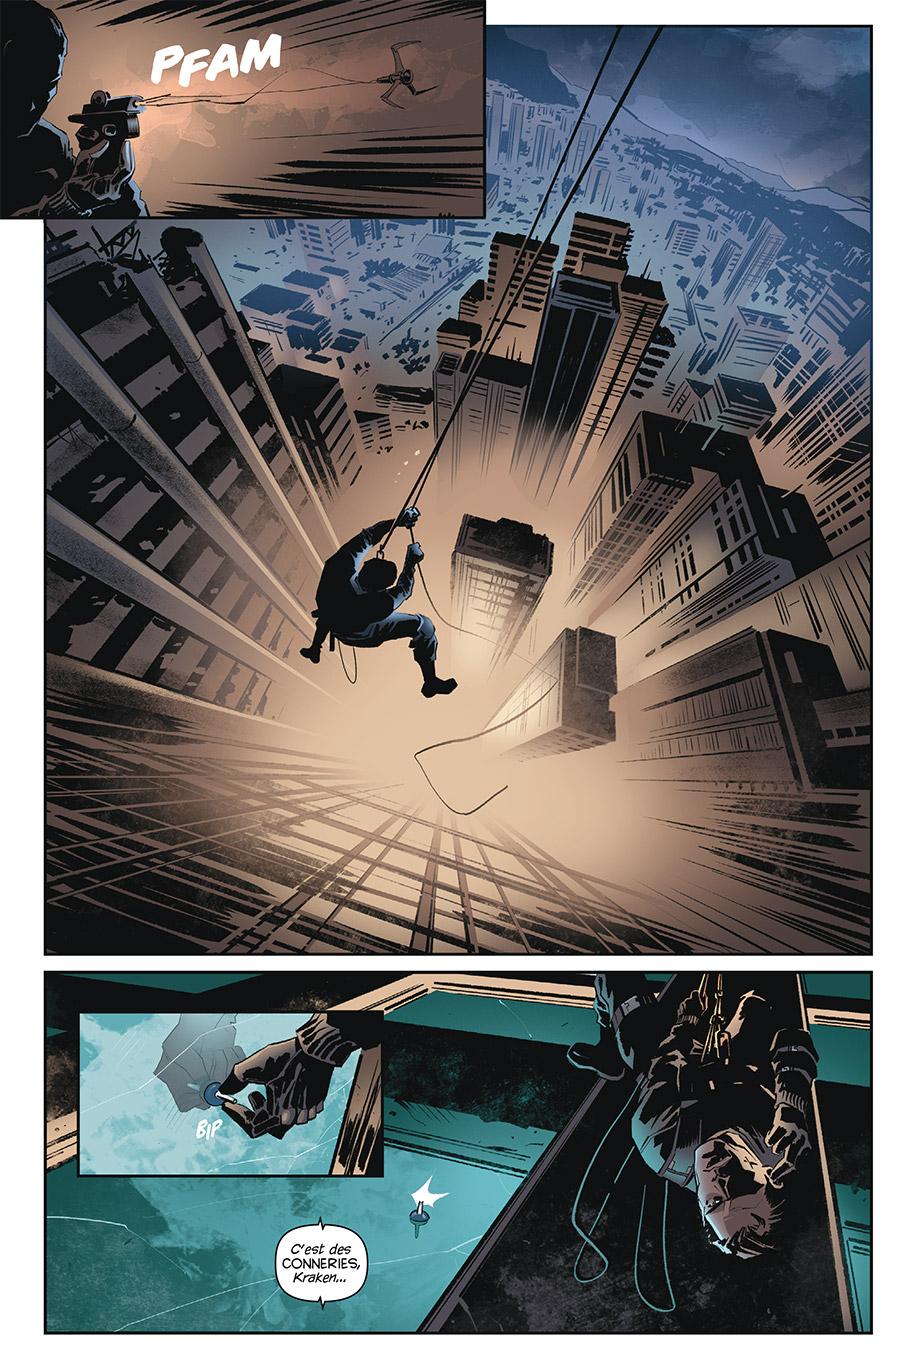 James Bond, tome 3 © Delcourt / Casalanguida / Diggle / Blythe